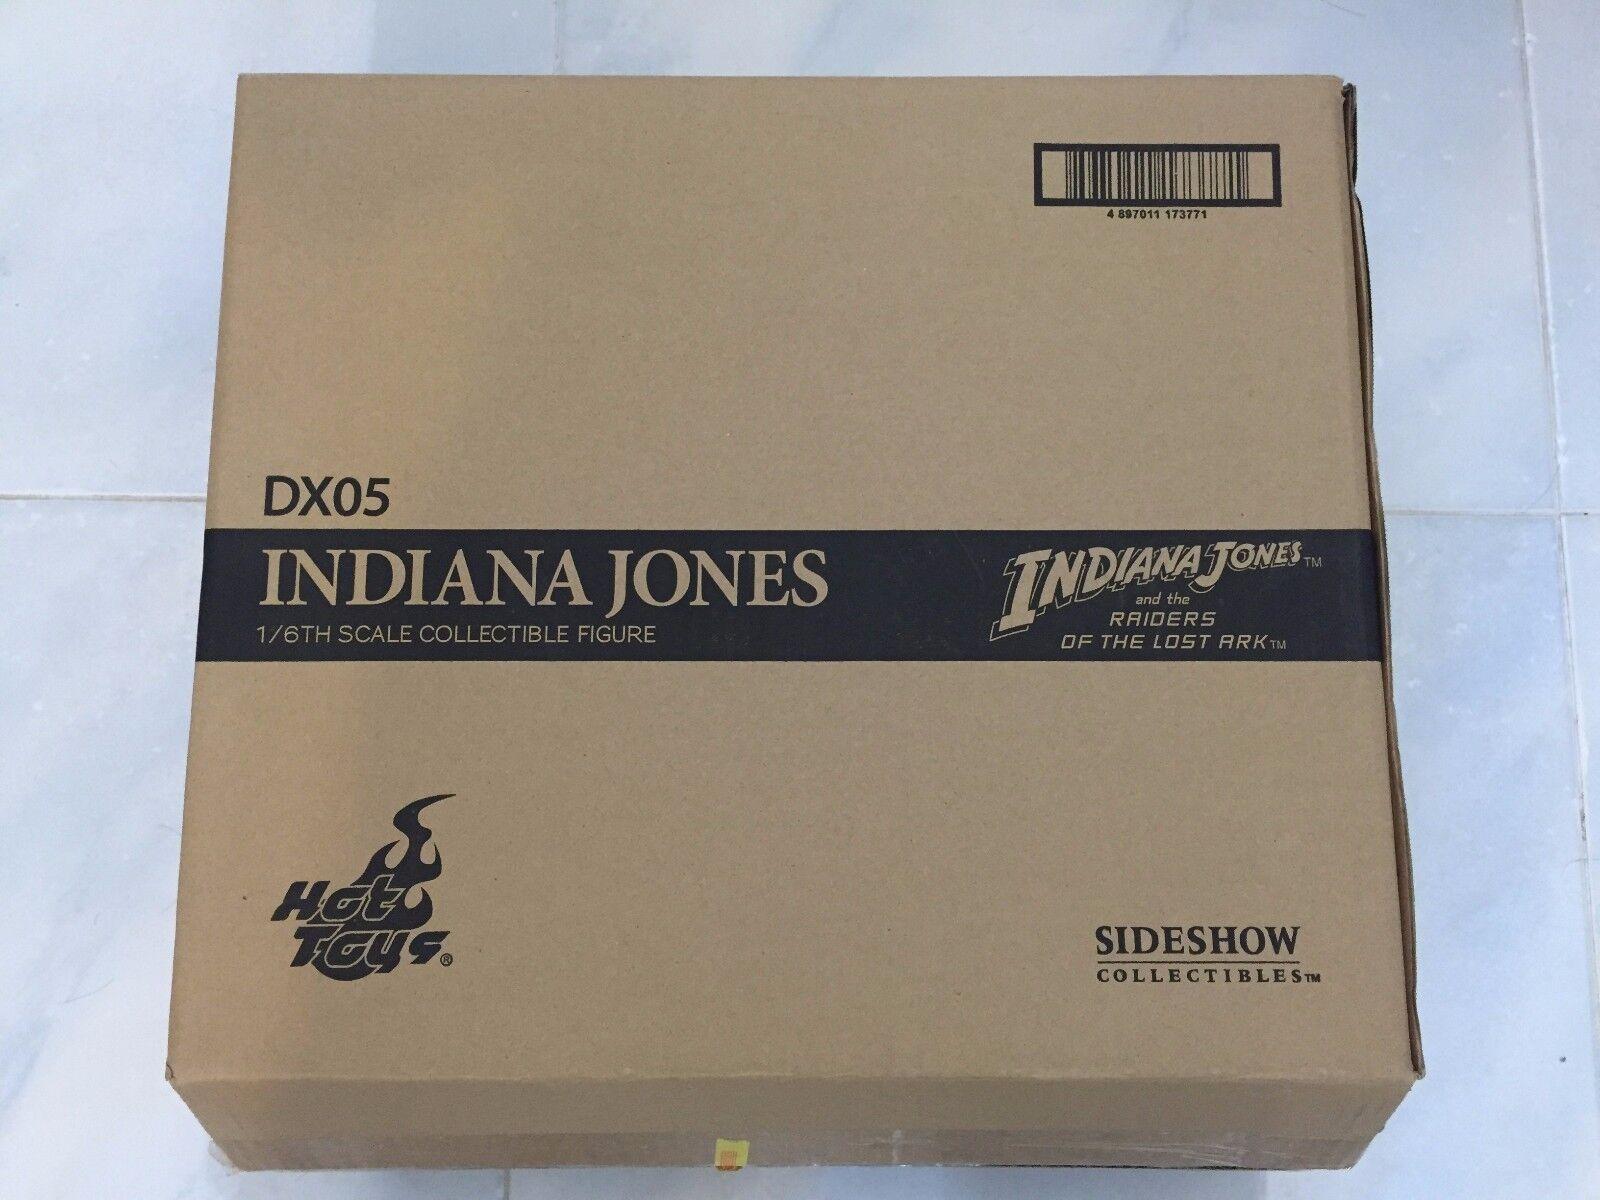 Caliente  giocattoli DX05 DX 05 Indiana Jones Raiders of the Lost Ark Harrison Ford OPEN  autentico online